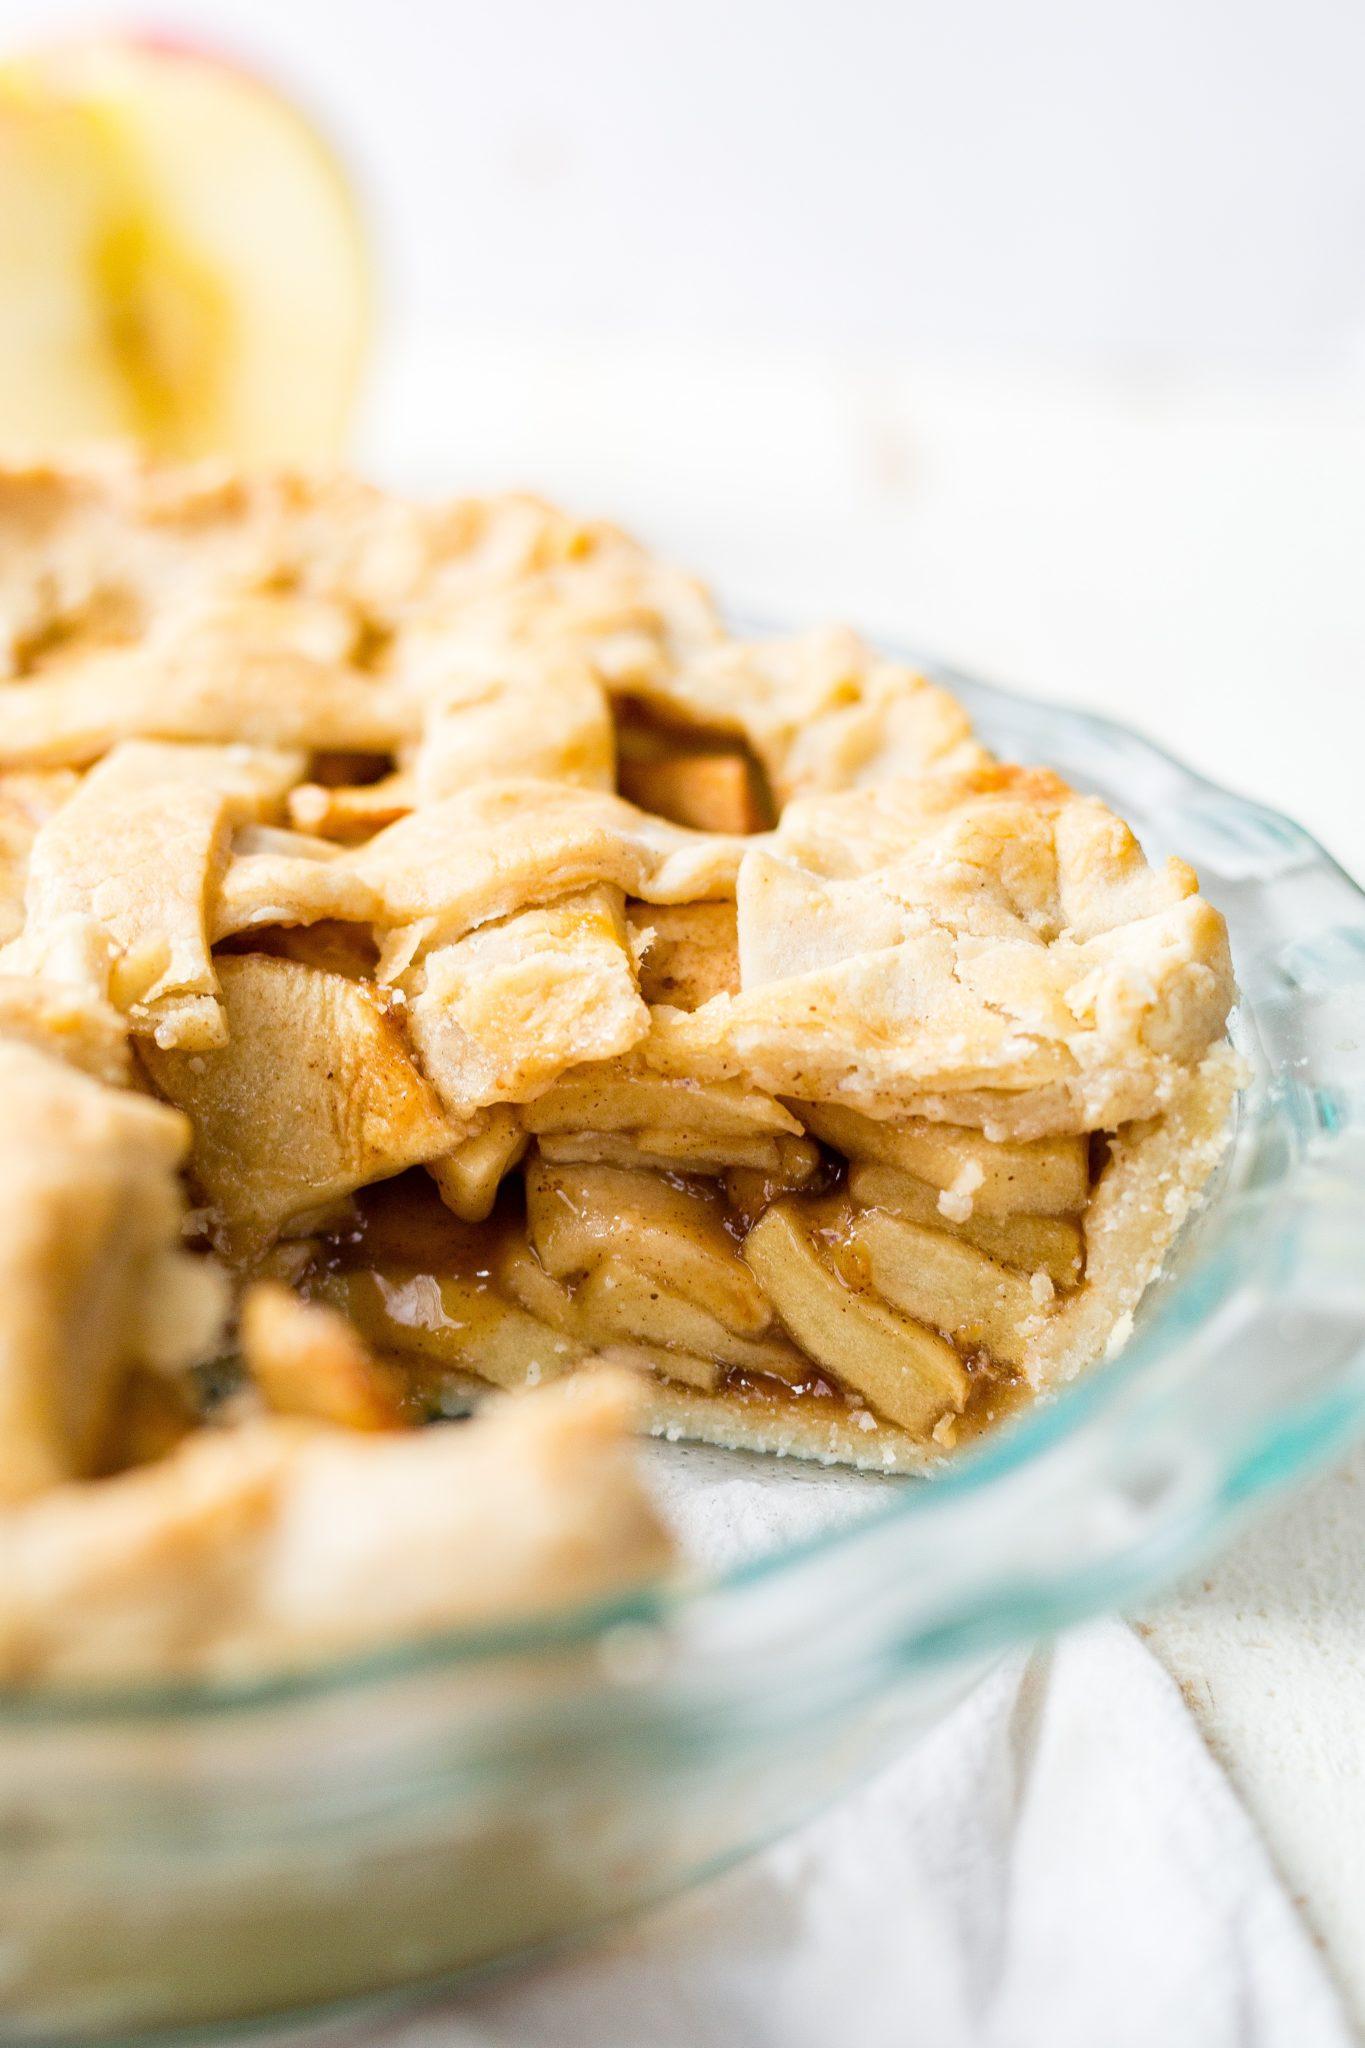 the inside of a piece of gluten free apple pie recipe